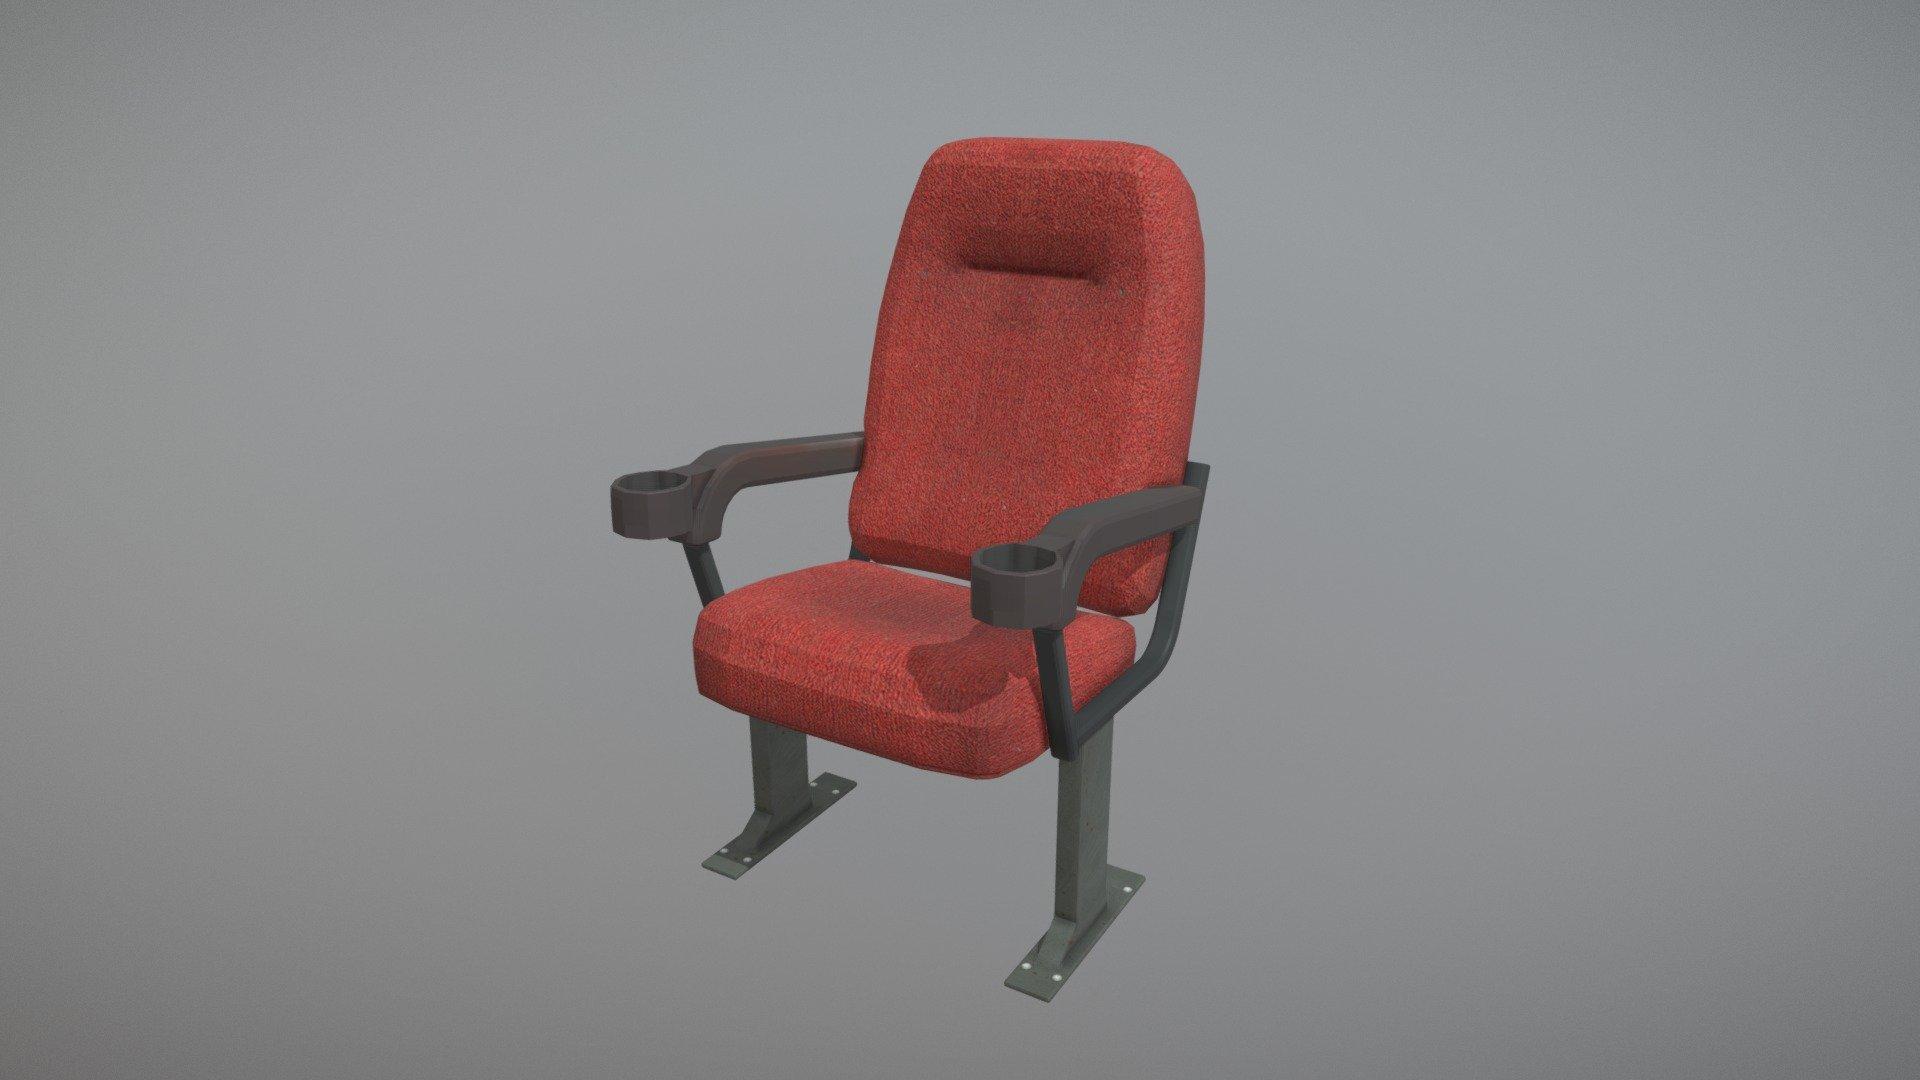 Movie Cinema Chair Buy Royalty Free 3d Model By Gabriel Quintana Gabrielquintana 44ea3b6 Sketchfab Store